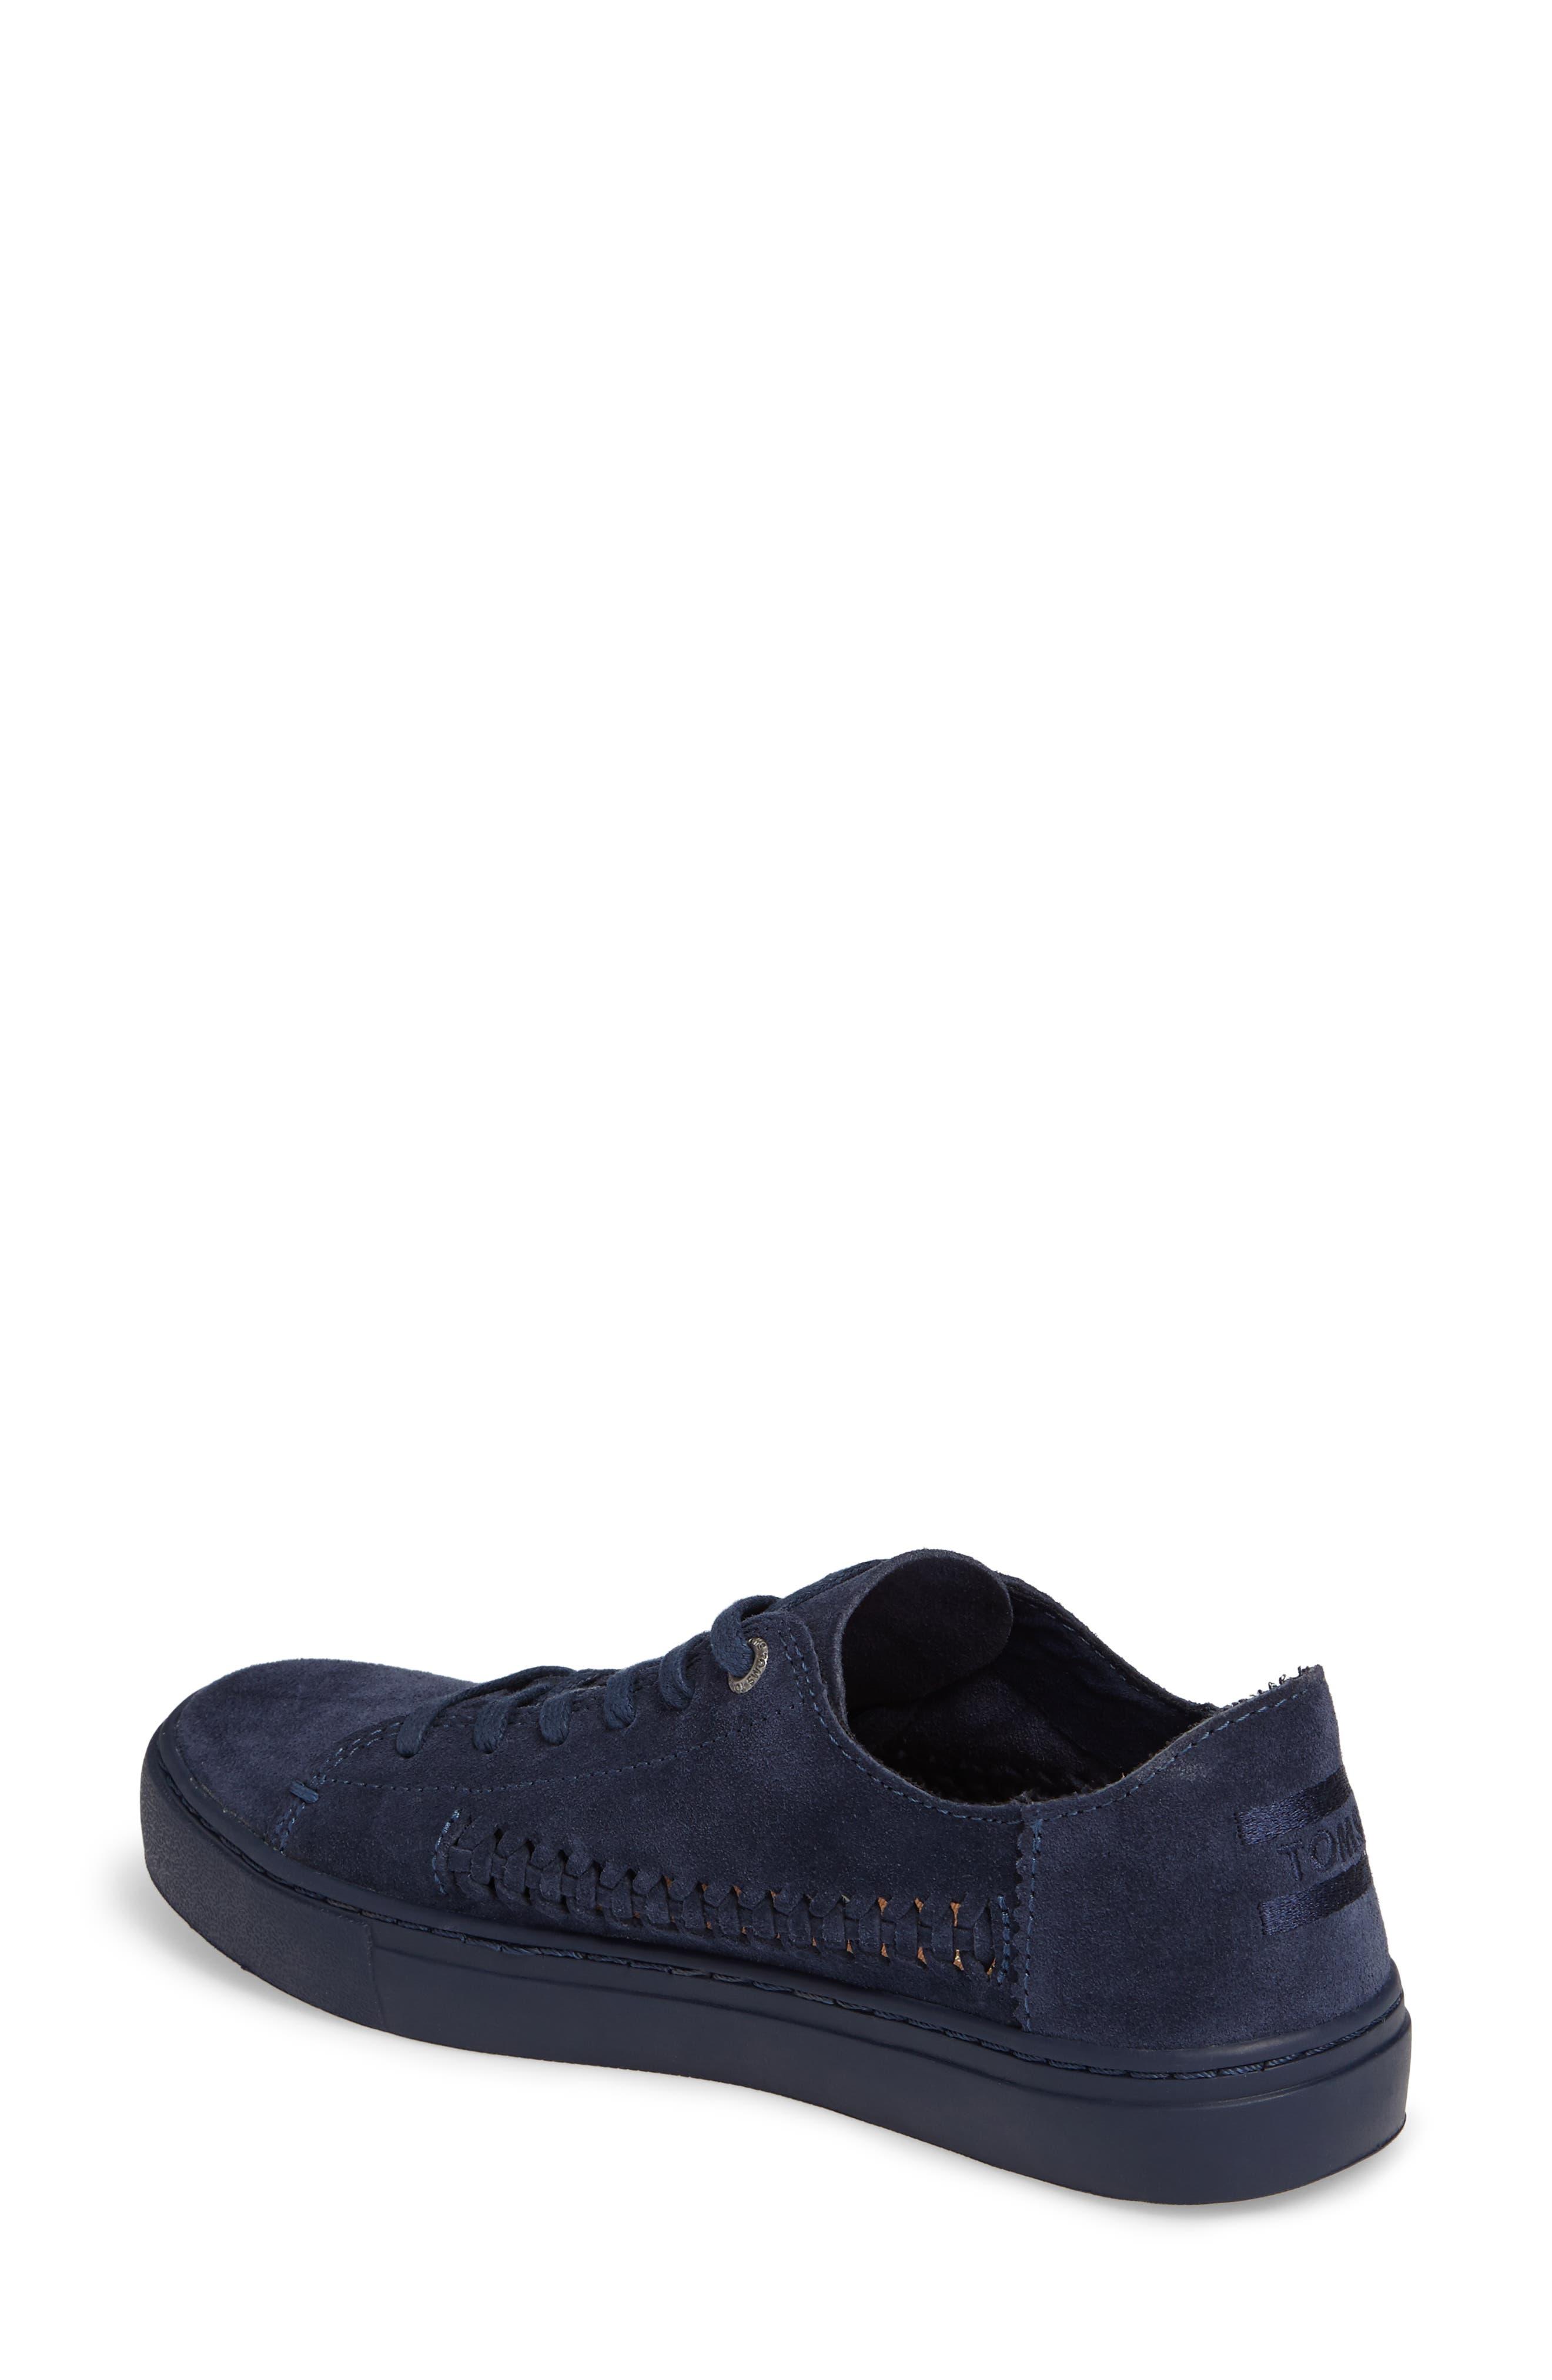 Lenox Sneaker,                             Alternate thumbnail 27, color,